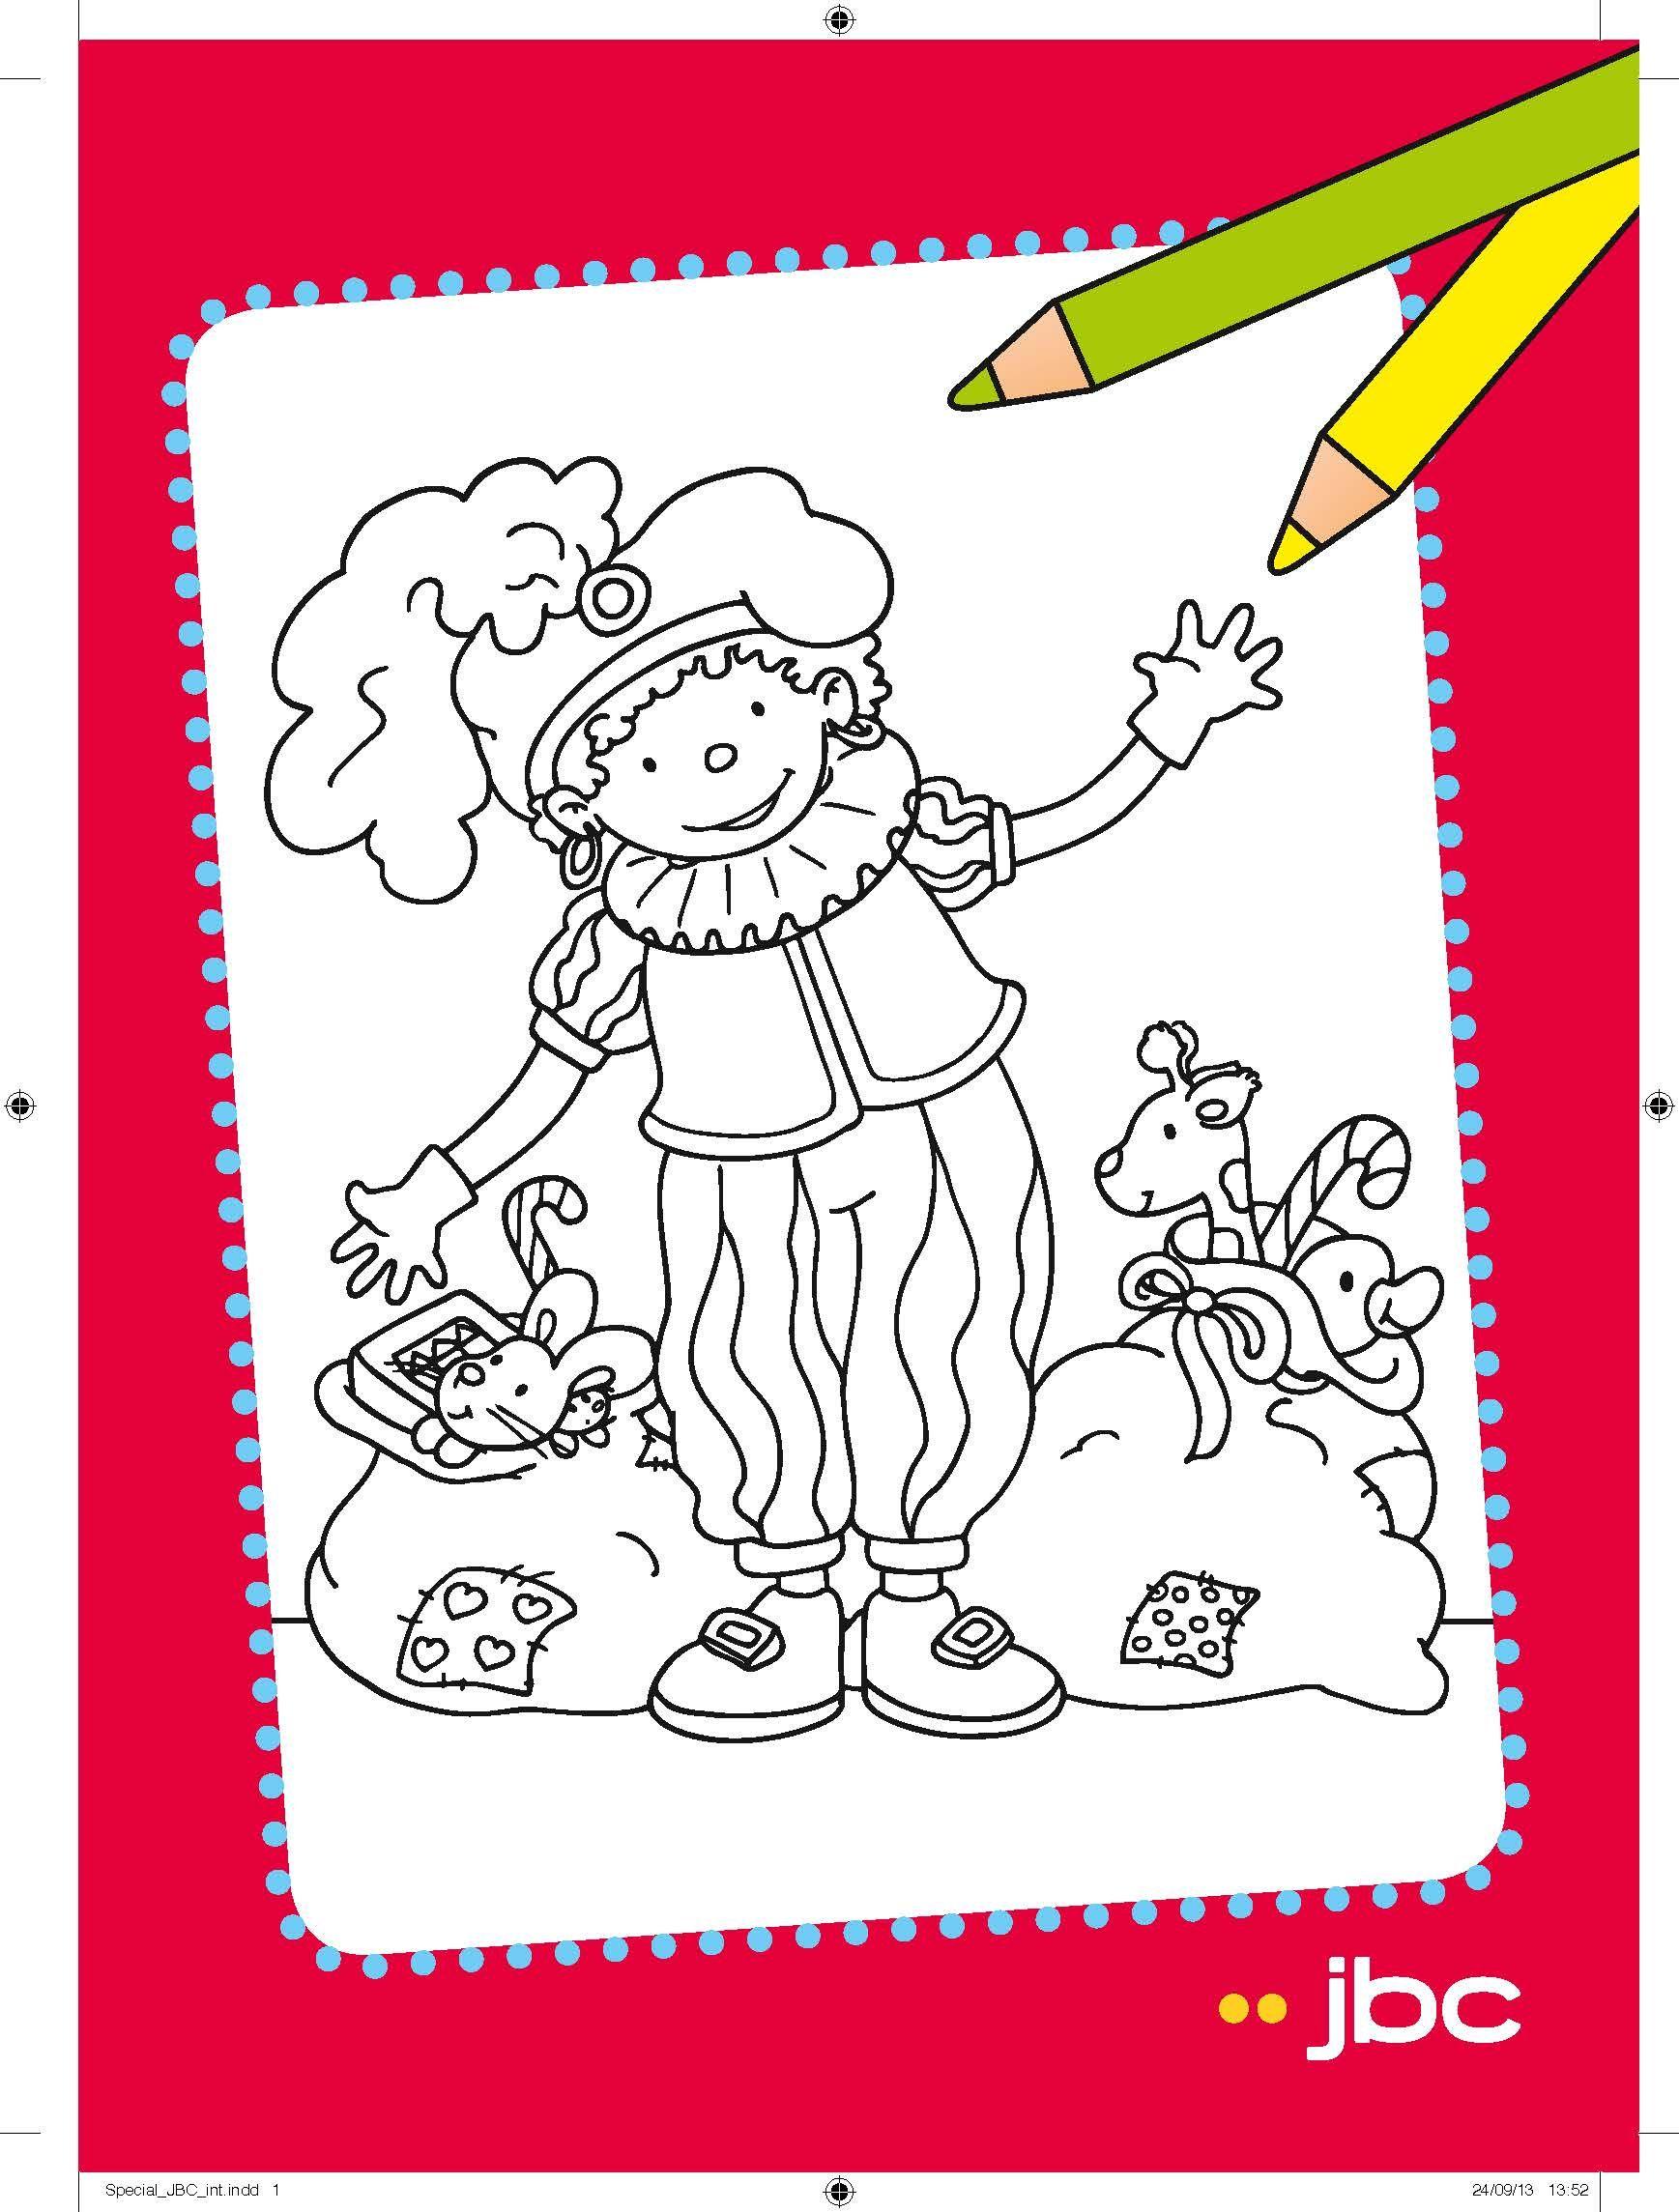 Drawing Kleurplaat Zwarte Piet Pere Fouettard Herenkleding Dameskleding Zwarte Piet